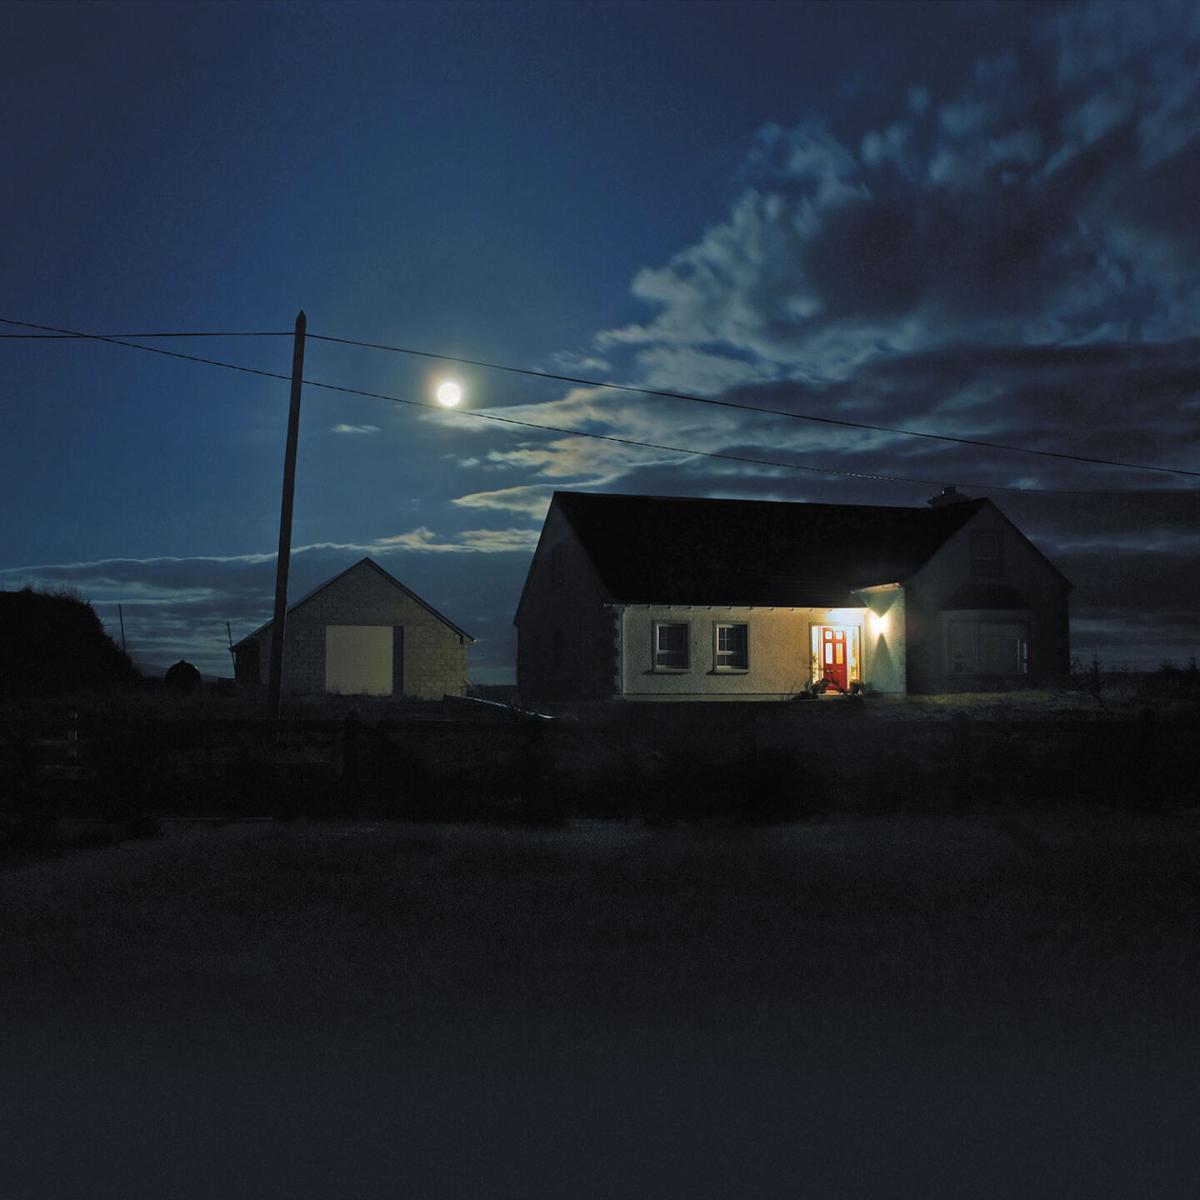 Moonlight may affect sleep cycles